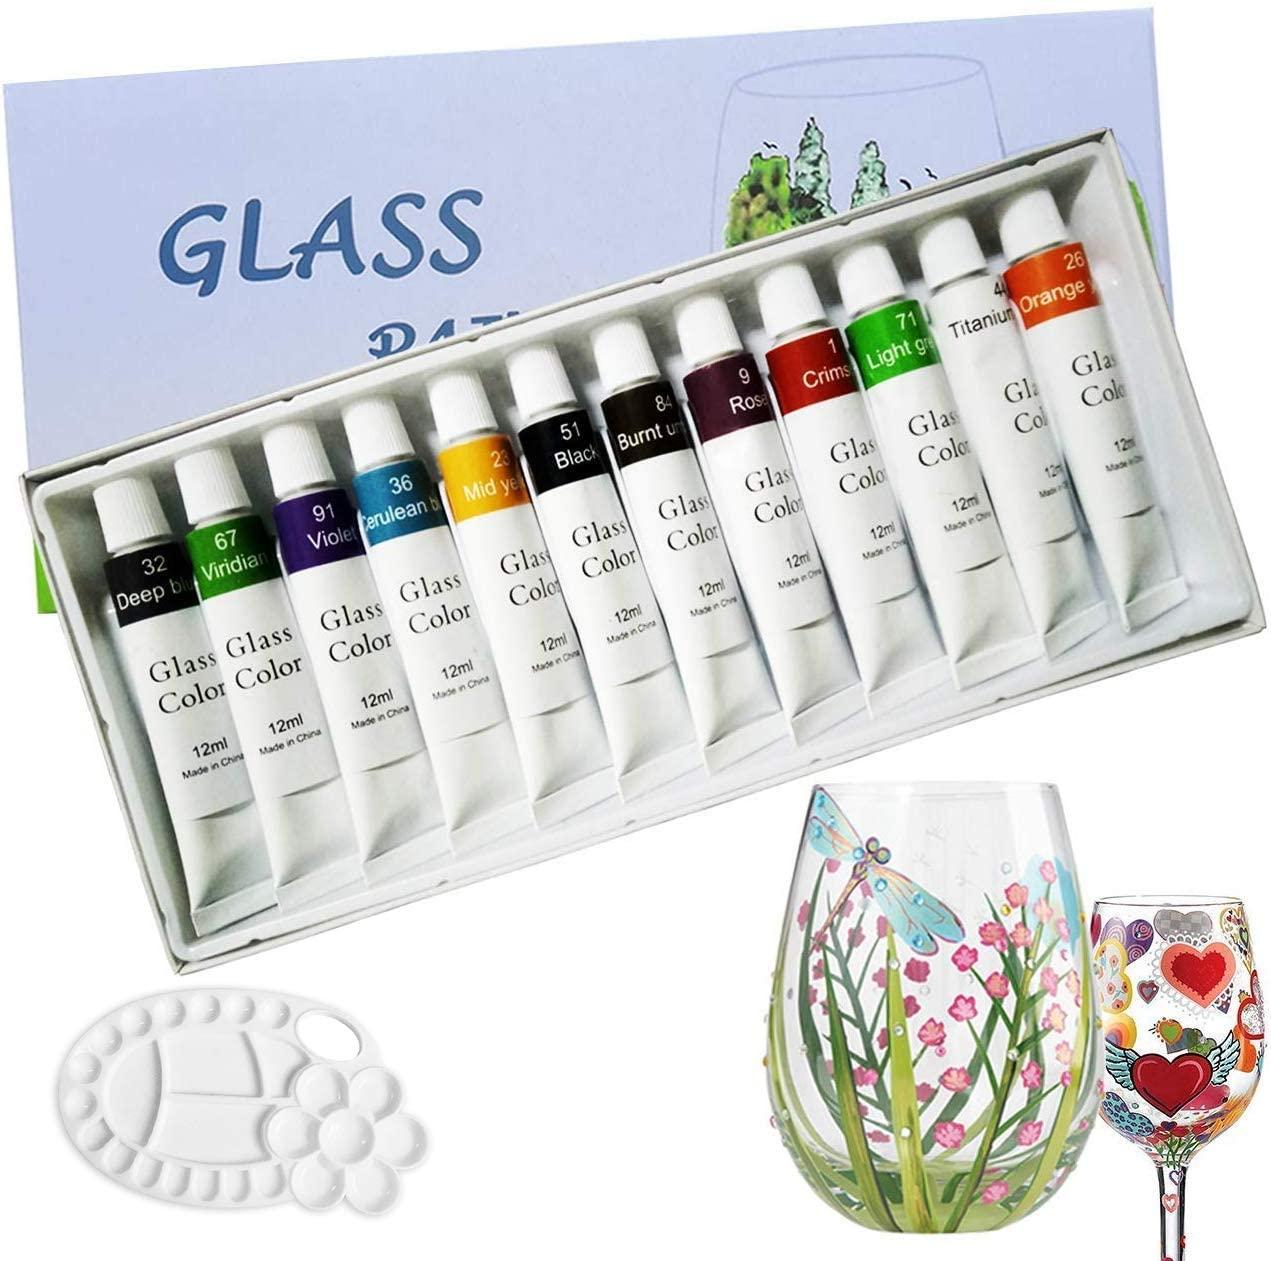 Magicdo Stained Glass Paint with Palette,Transparent Glass Window Paint Acrylic Enamel Paint Set Great for Wine Bottle, Light Bulbs, Ceramic (12 Colorsx0.4 Fl oz)